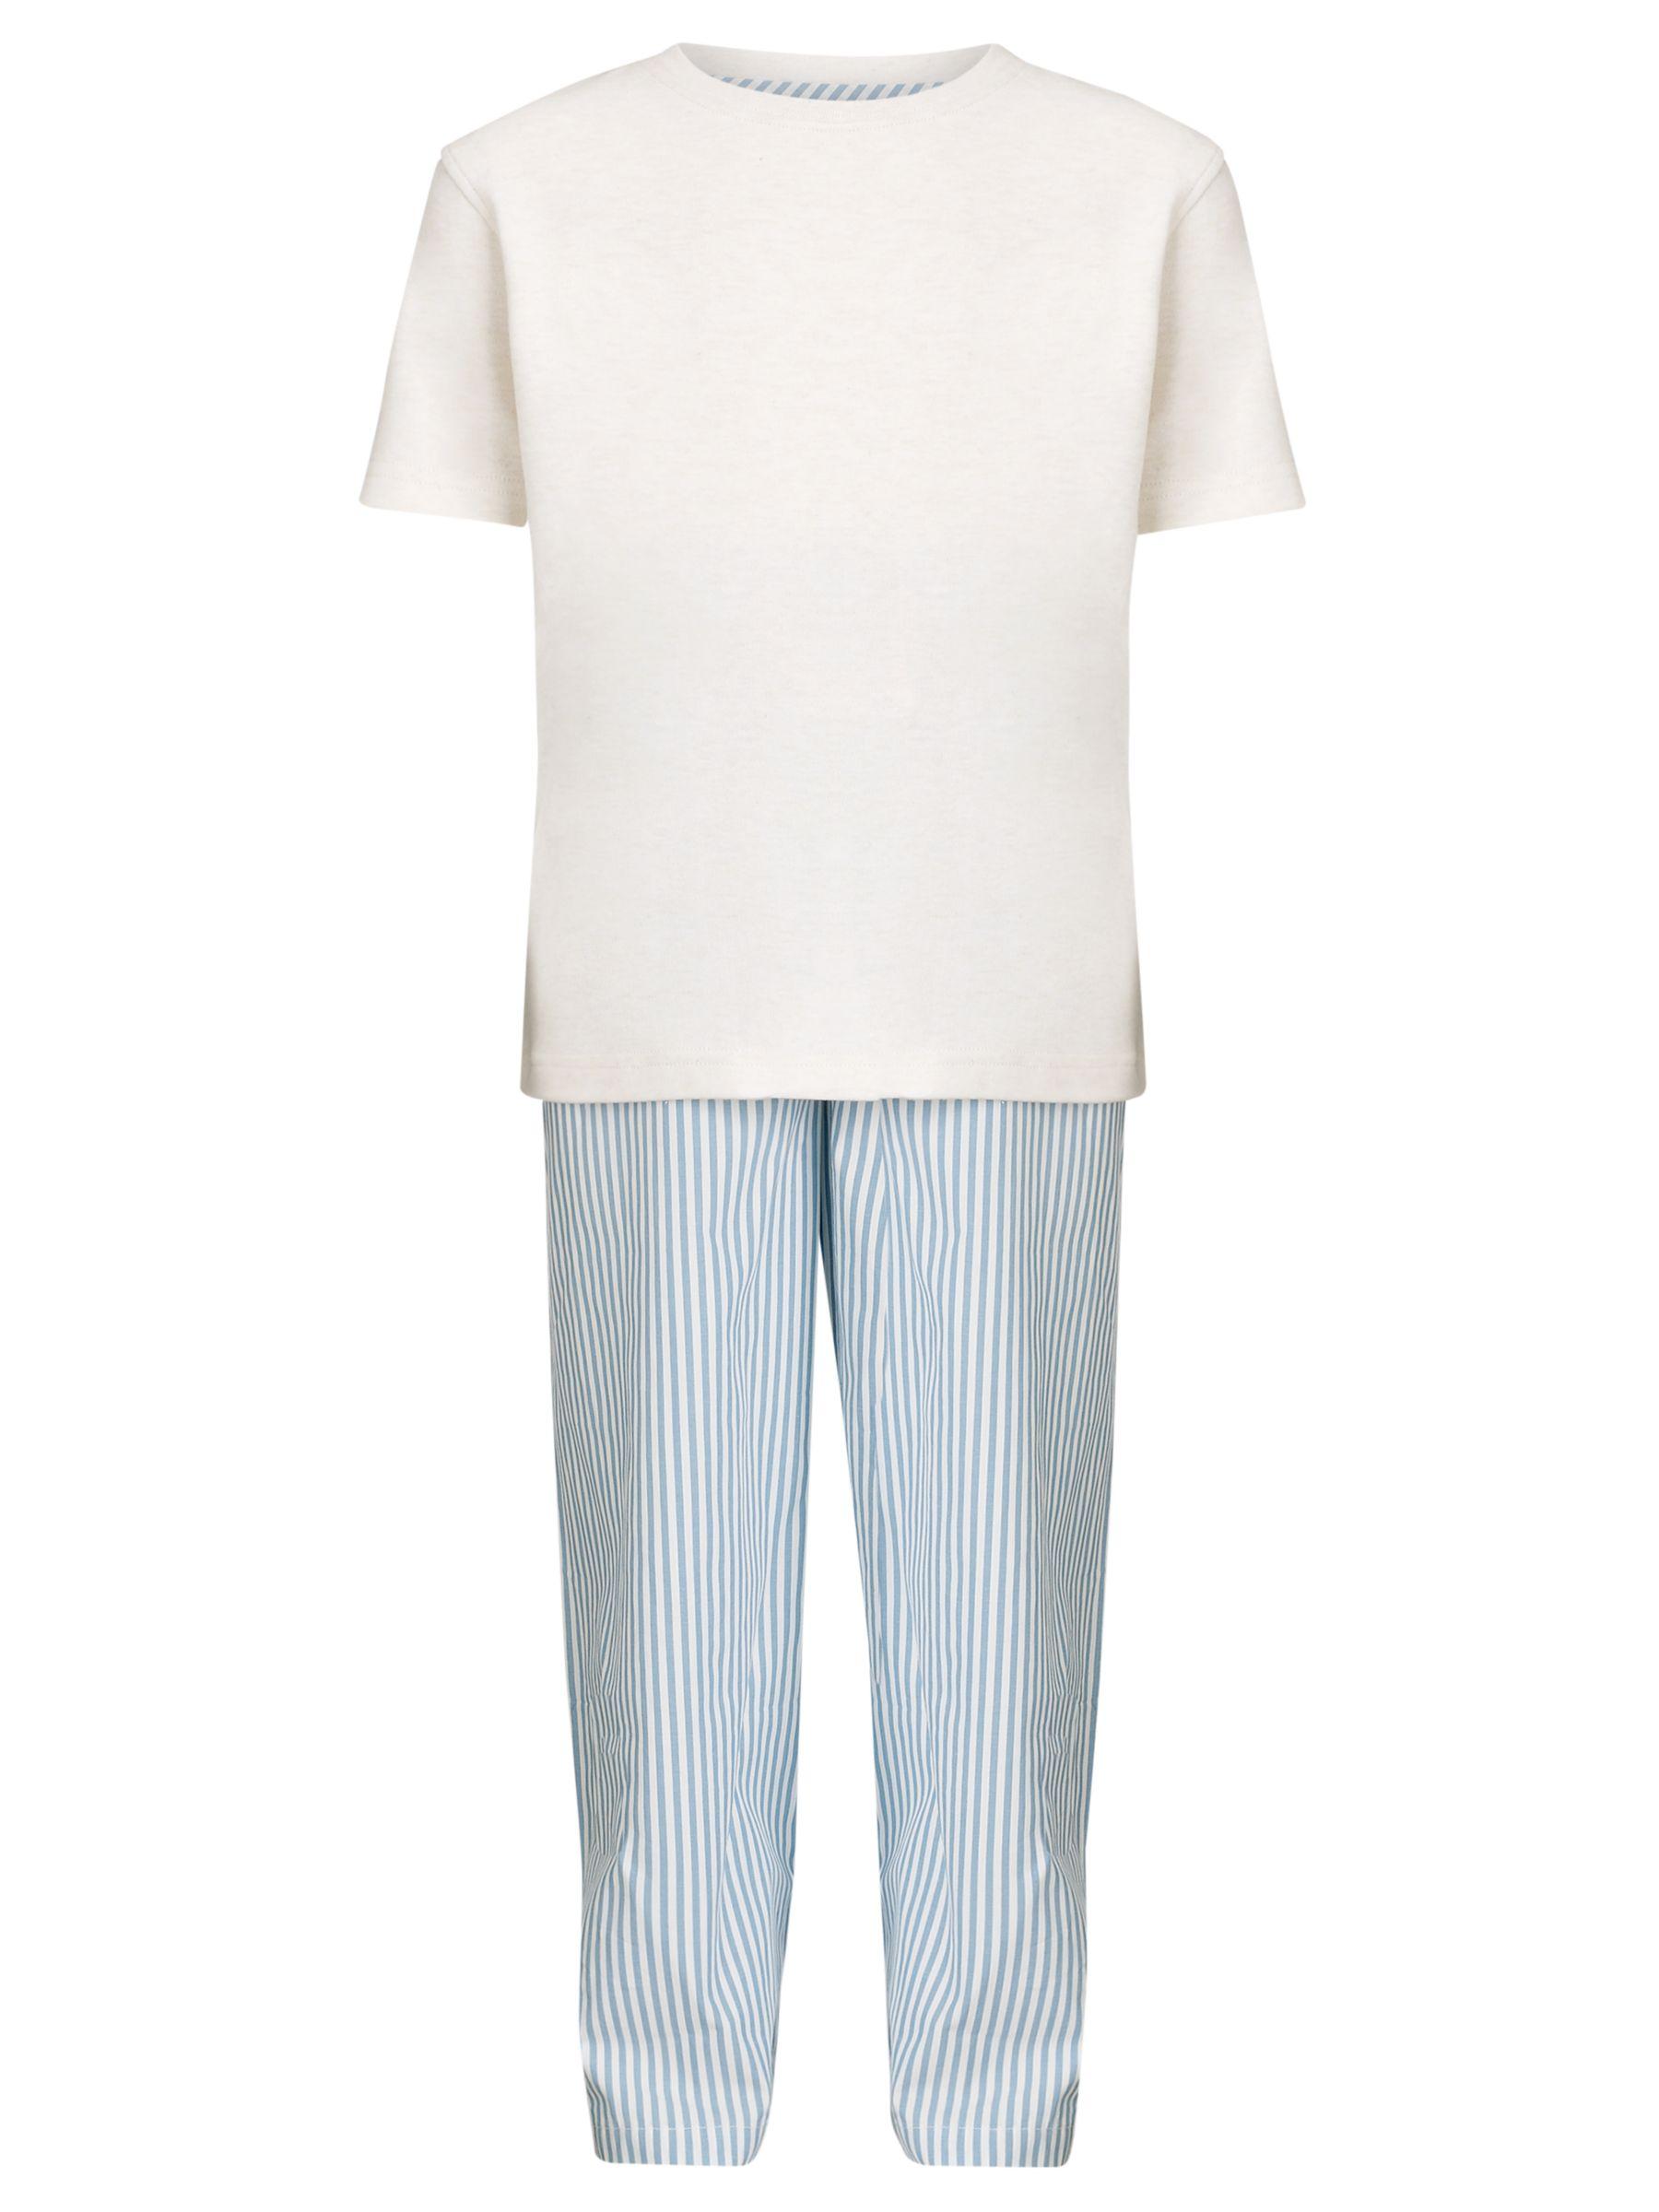 John Lewis Boy Striped Pyjamas, White/Blue